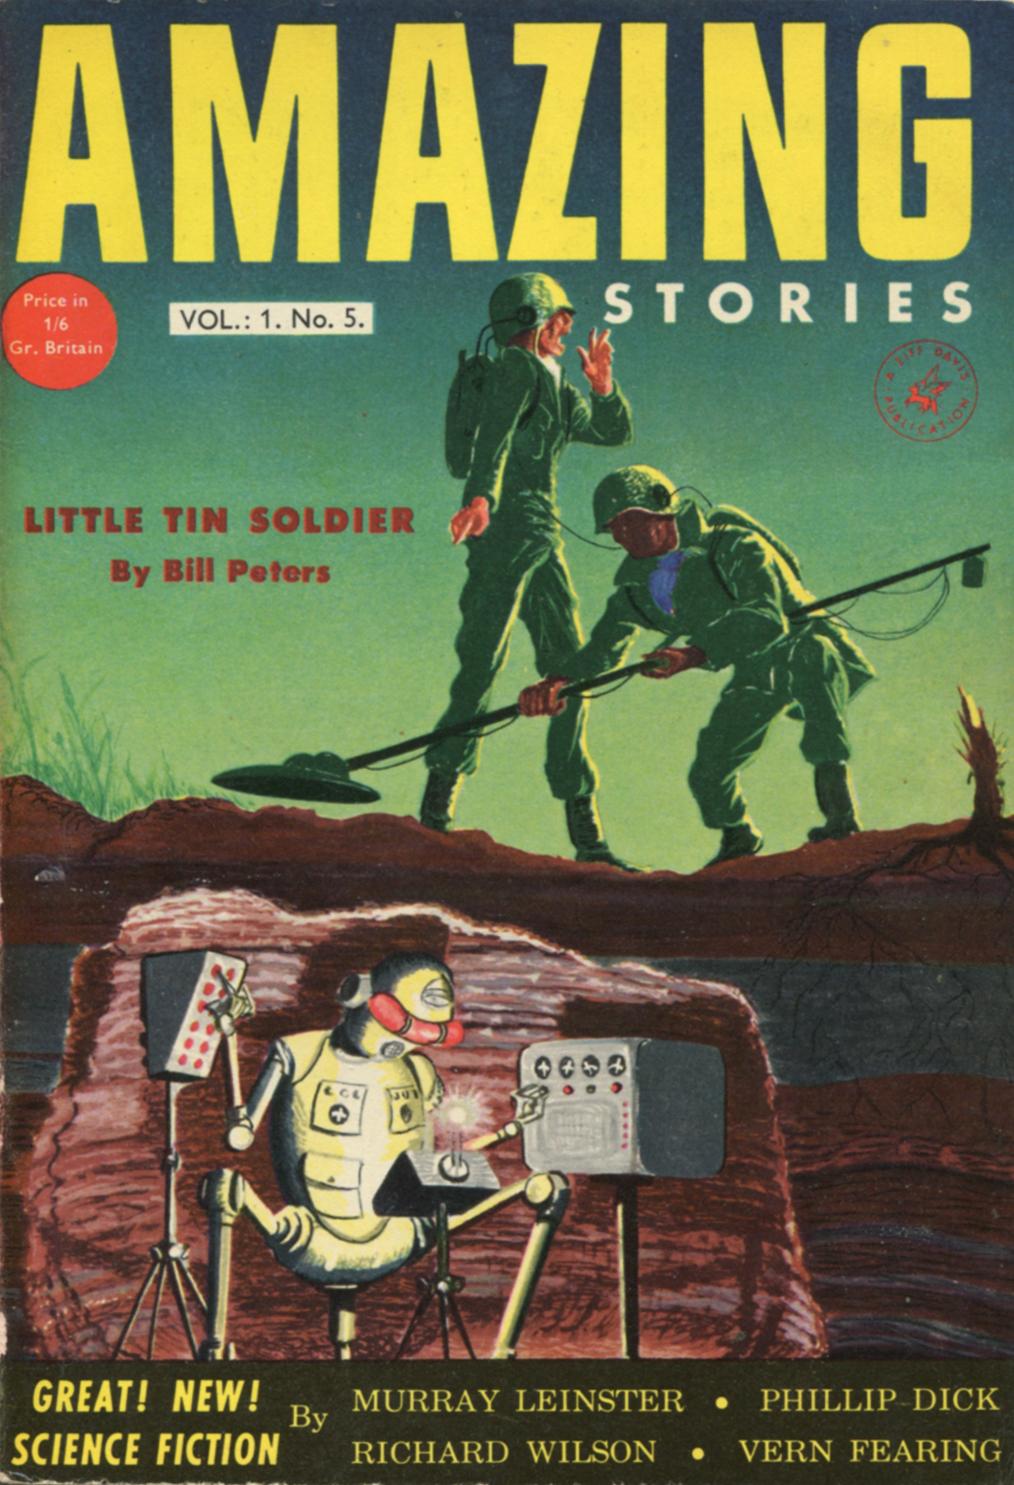 Amazing Stories Volume 21 Number 06: Ski-Ffy: AMAZING STORIES VOL. 1 NO. 5 1954